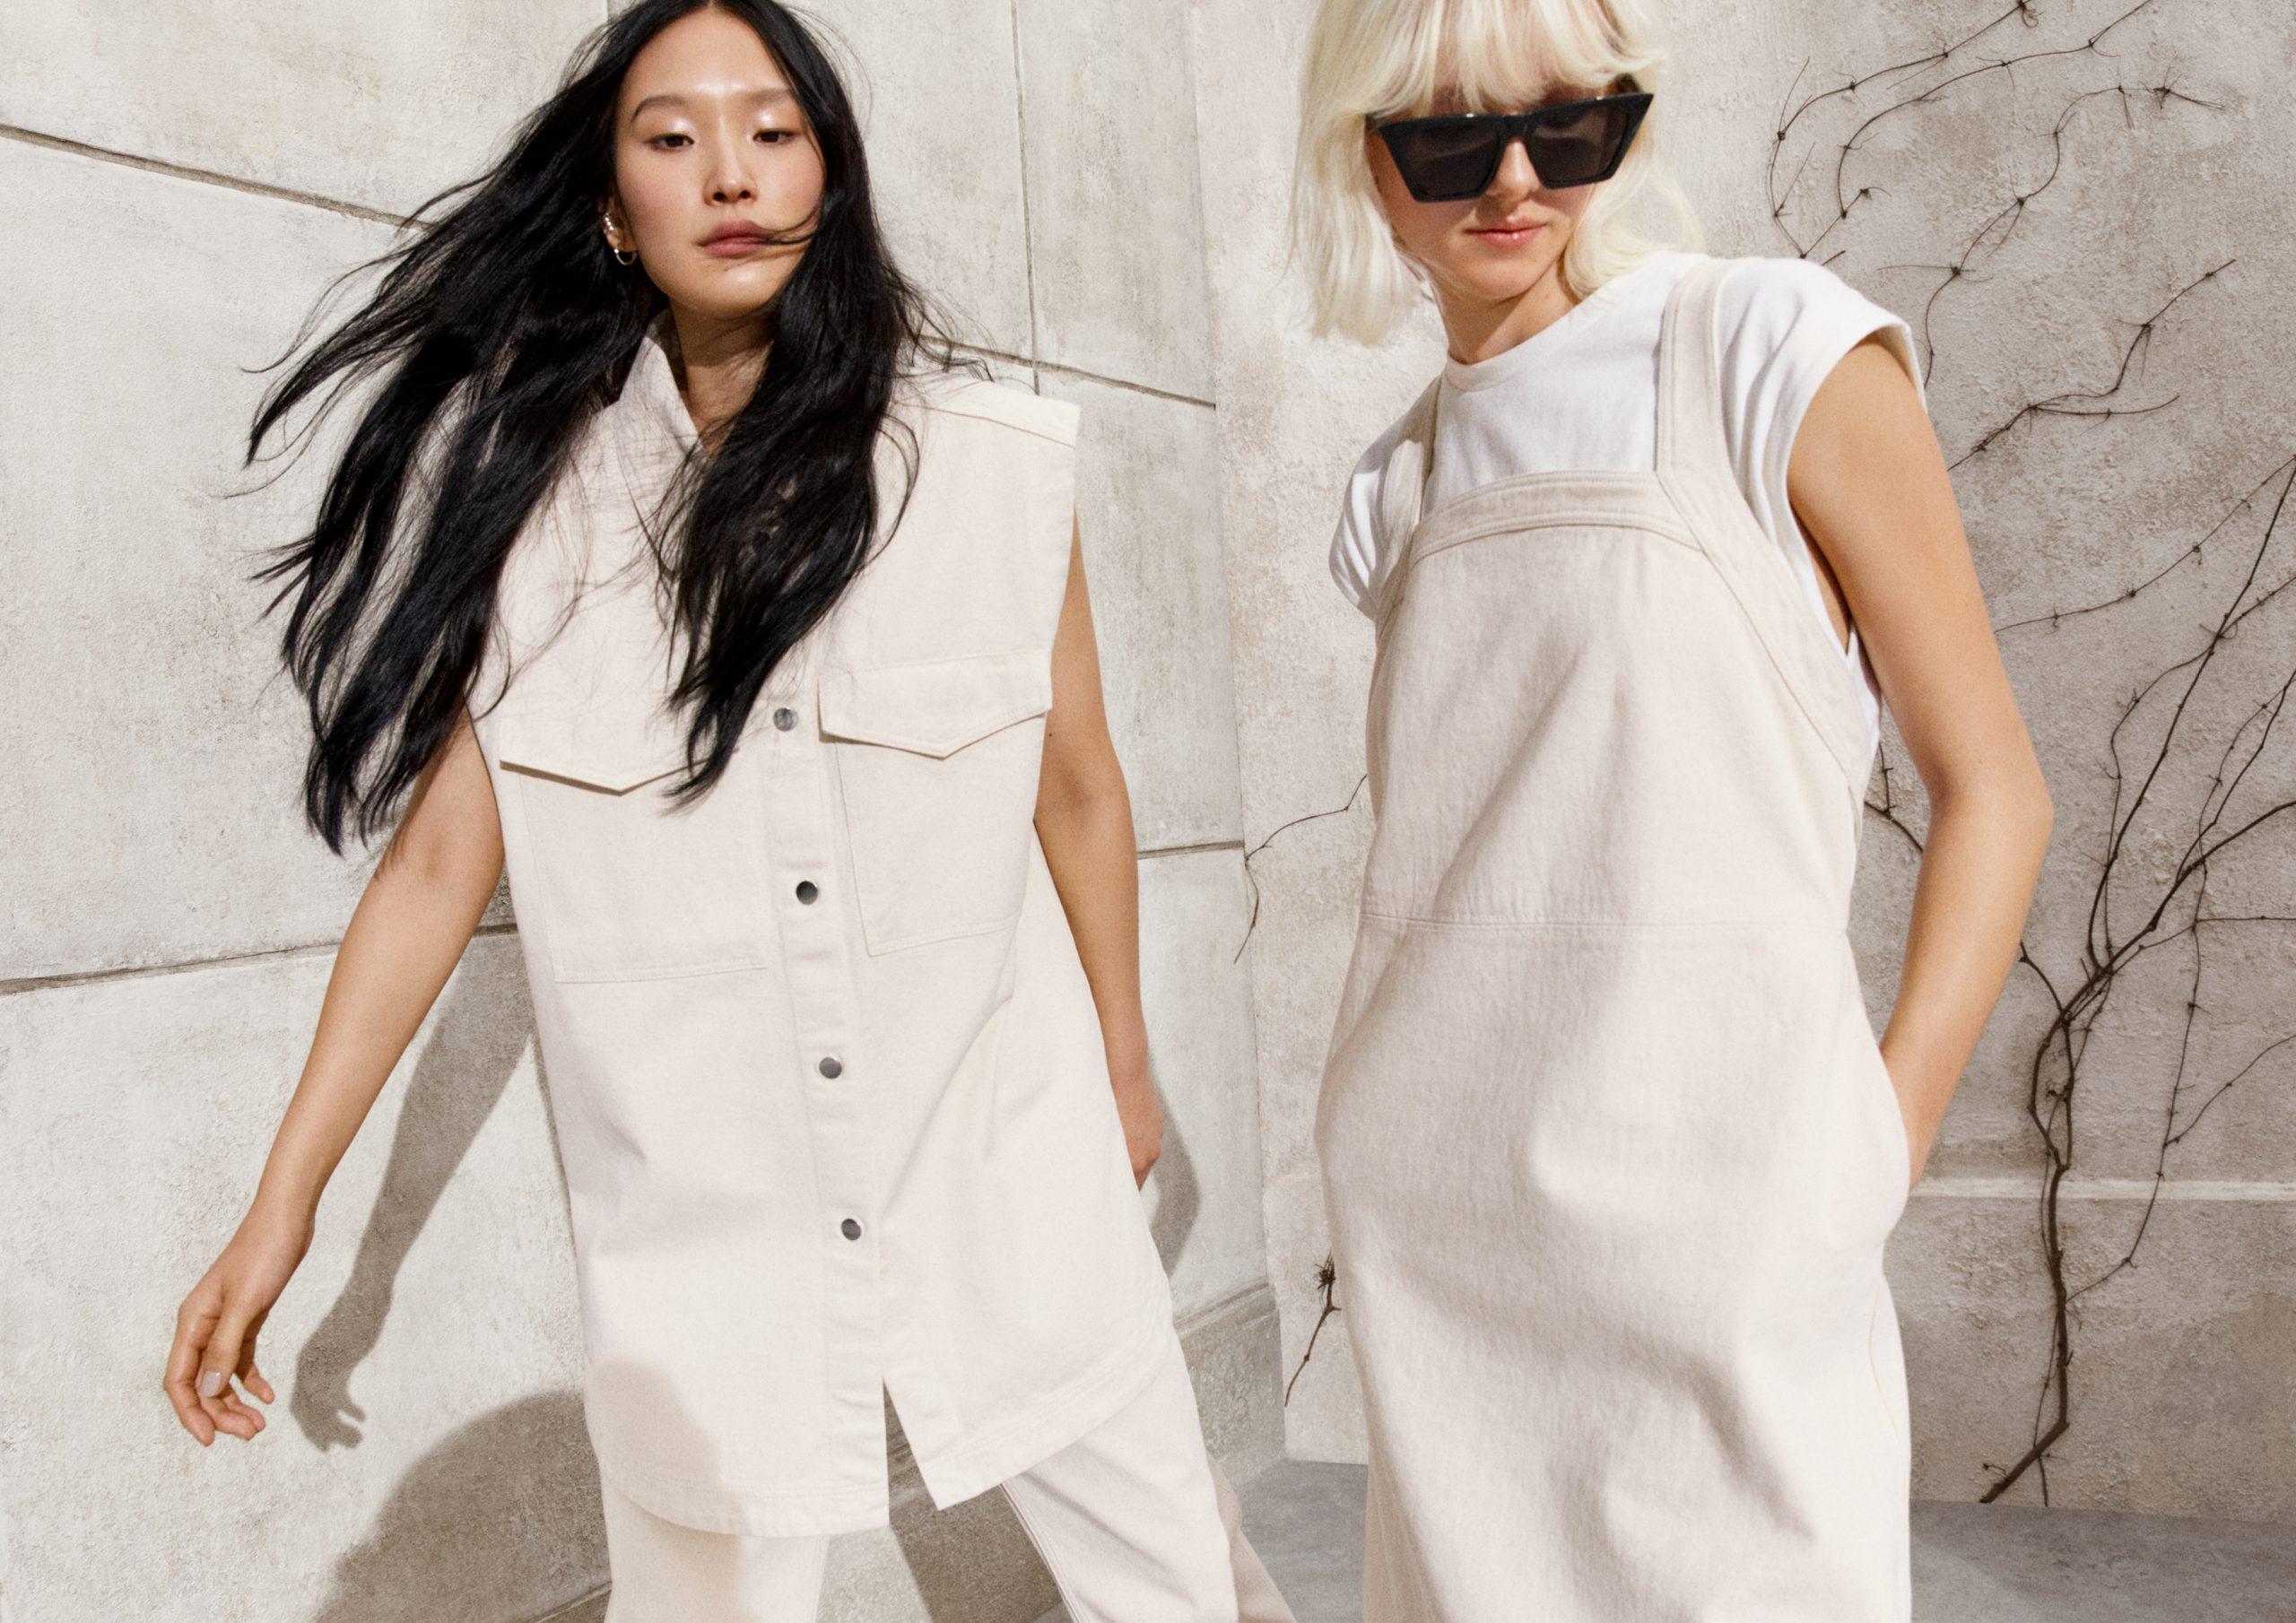 1103-Spring-Fashion-Landscape-Campaign-Images-300ppi-05